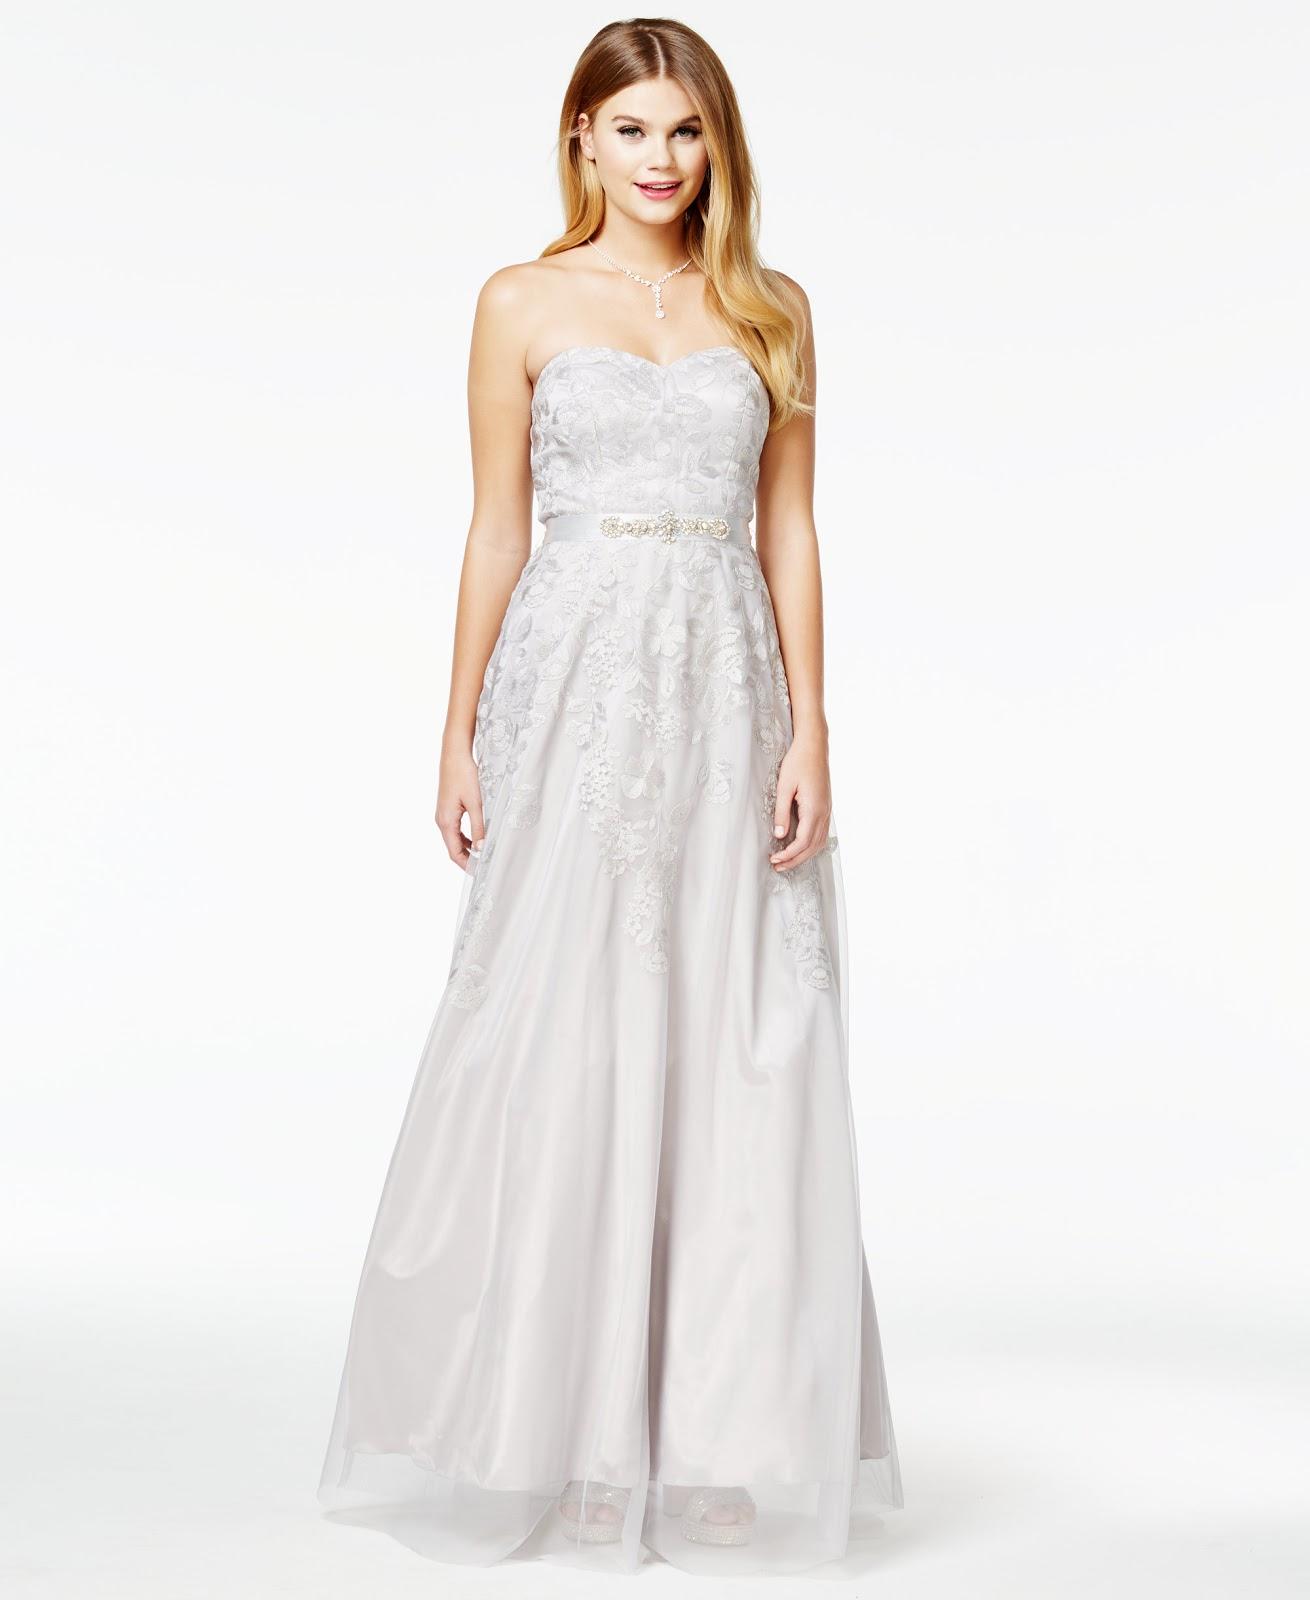 Catalog Cuties: Prom Dresses, Part 7